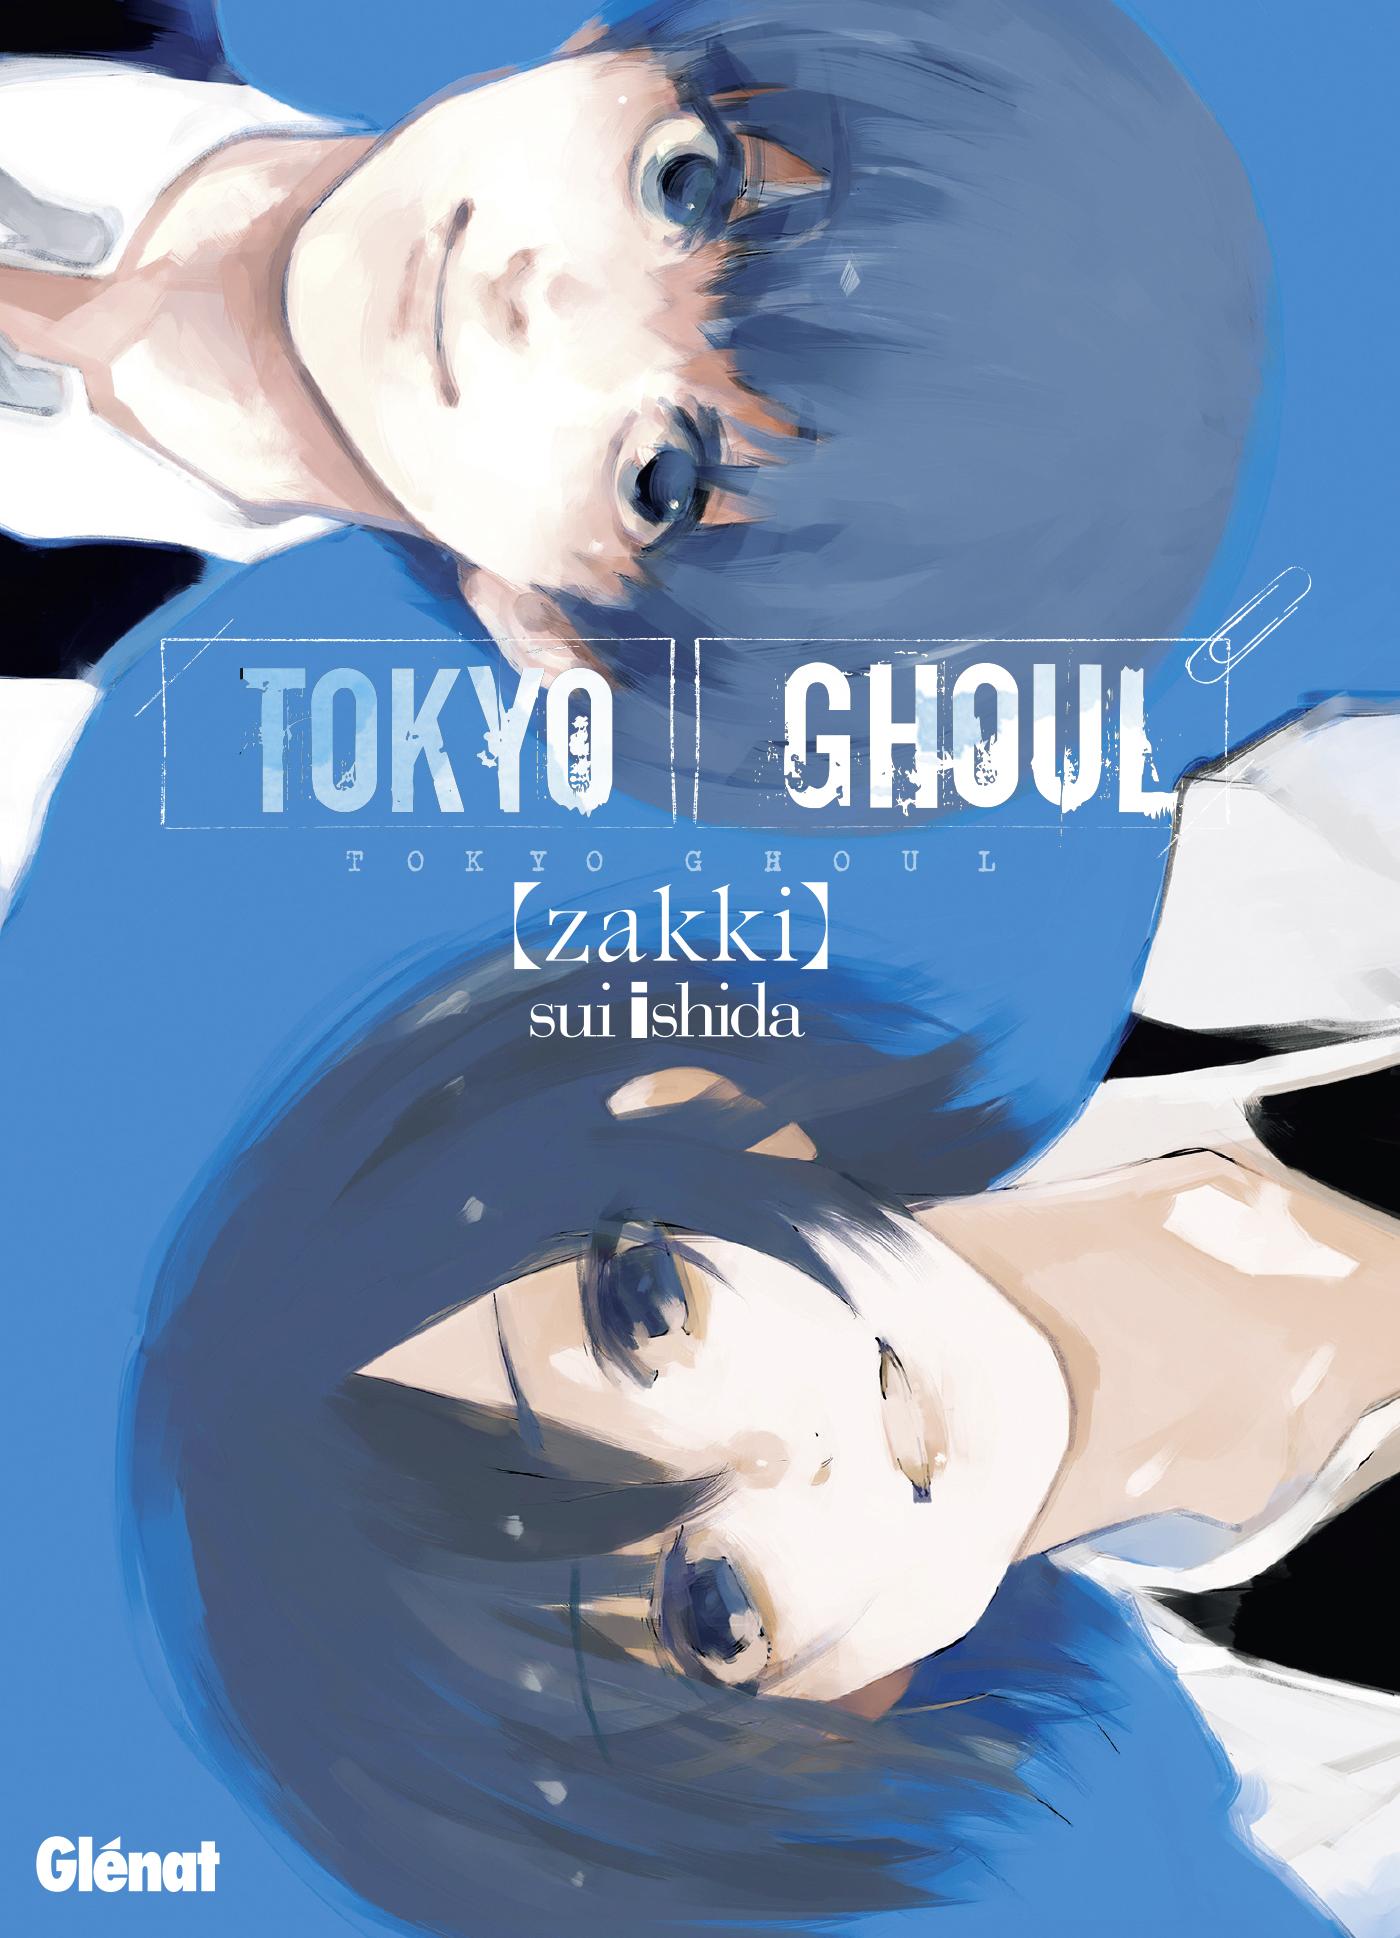 Tokyo Ghoul [zakki] 1